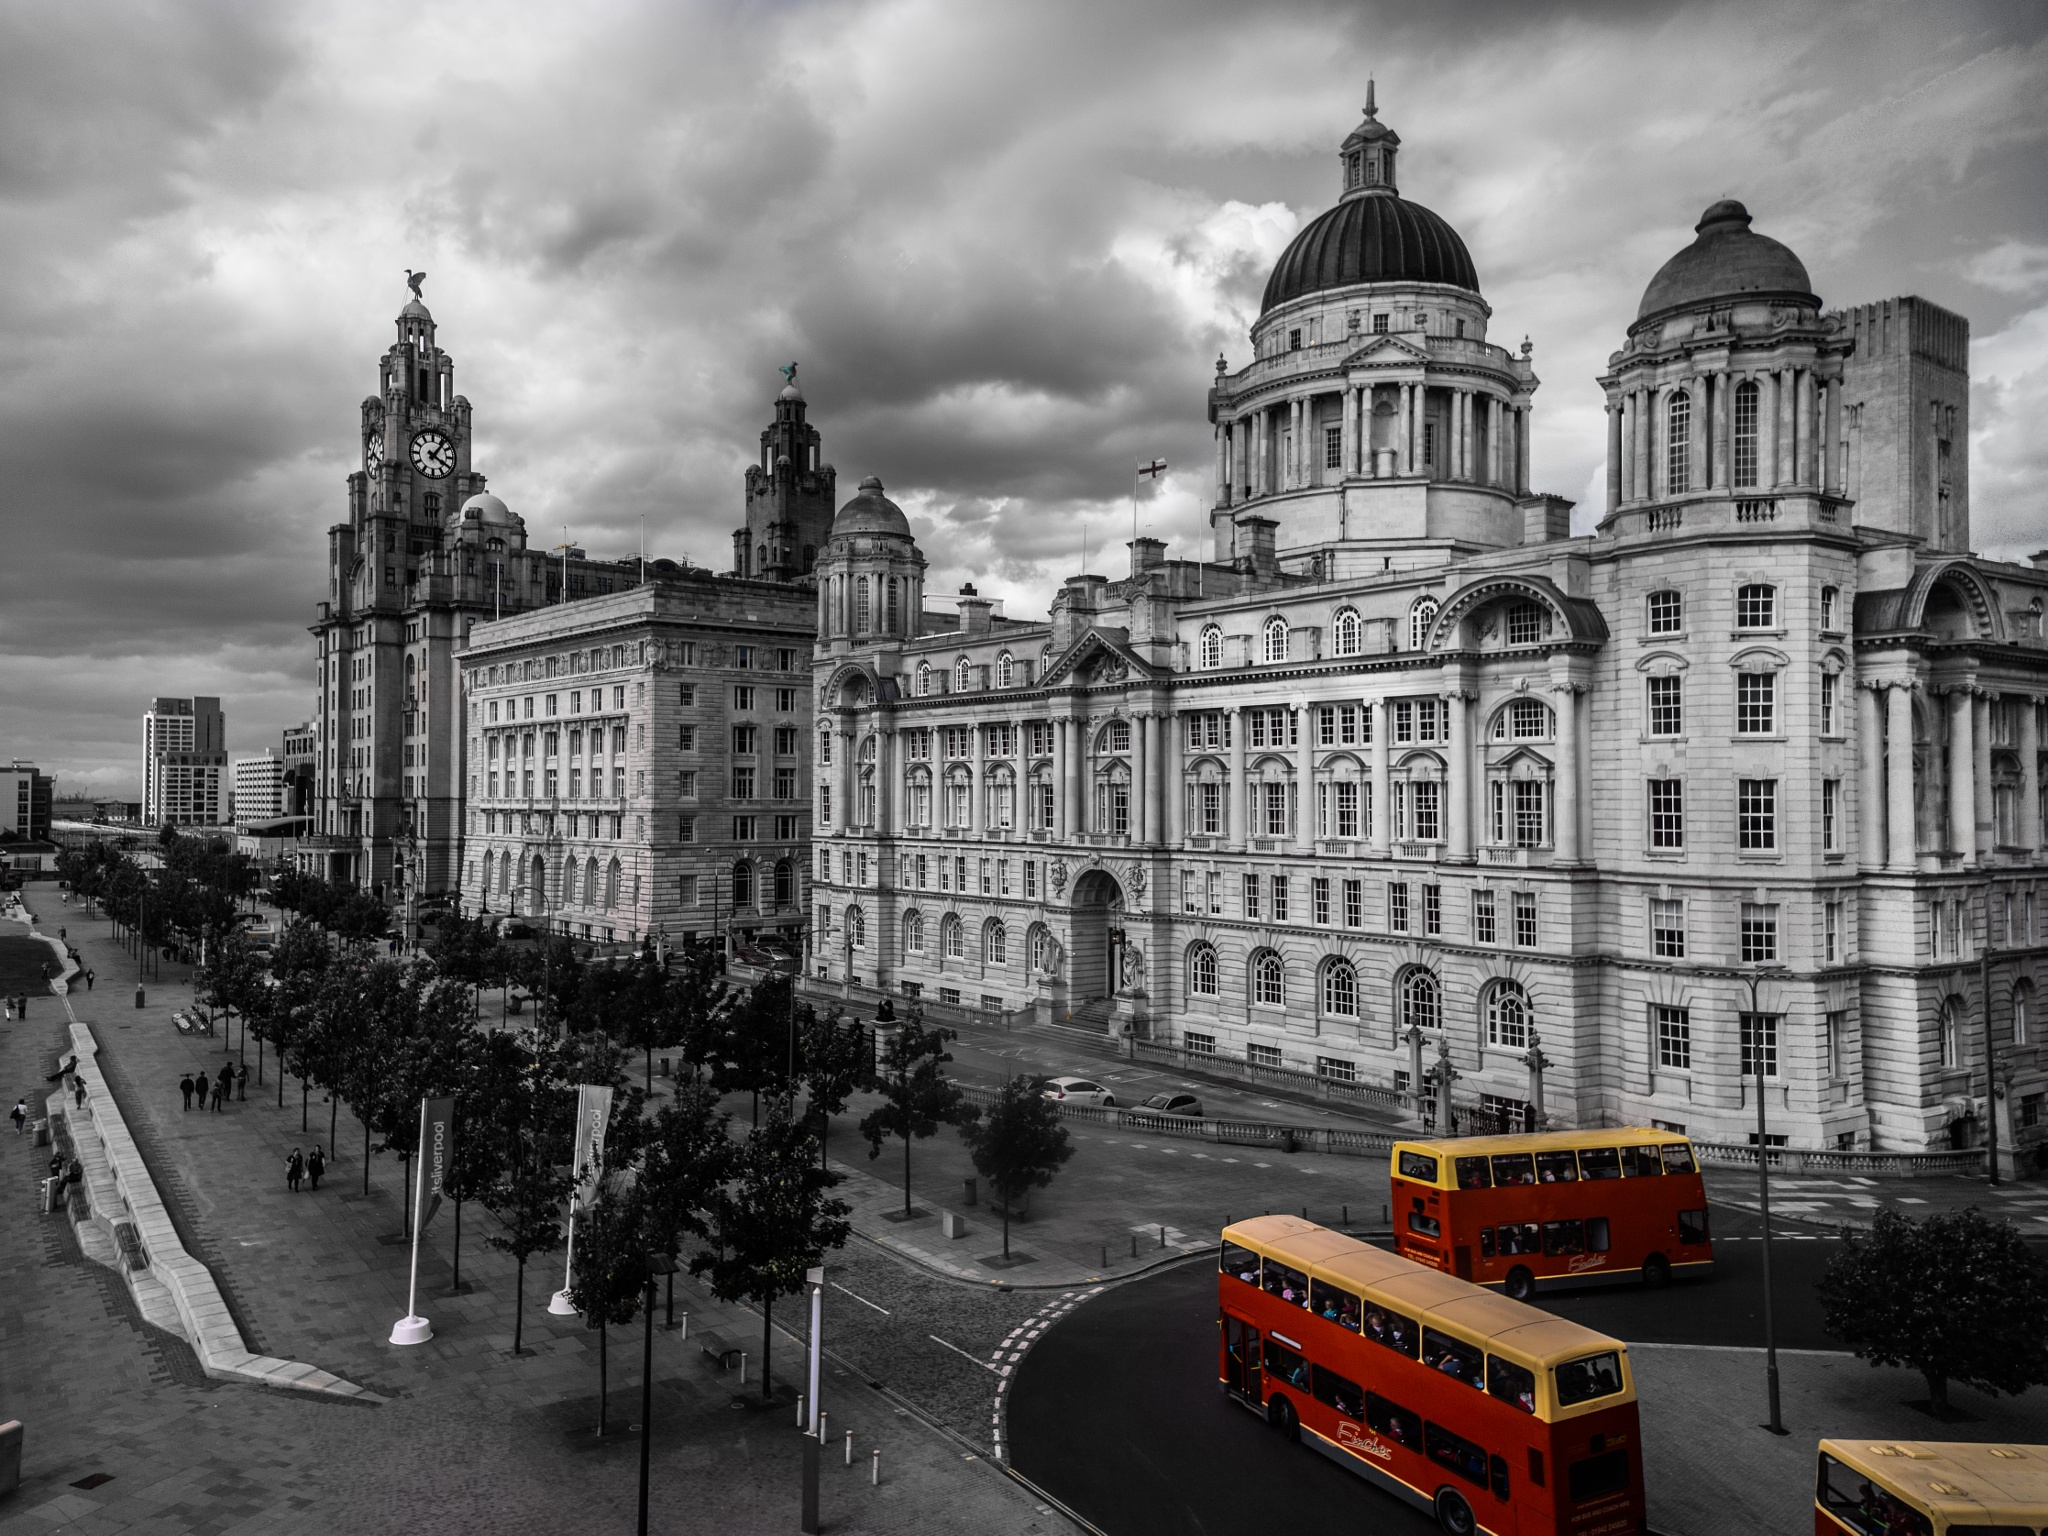 Liverpool by Craig Wilkinson